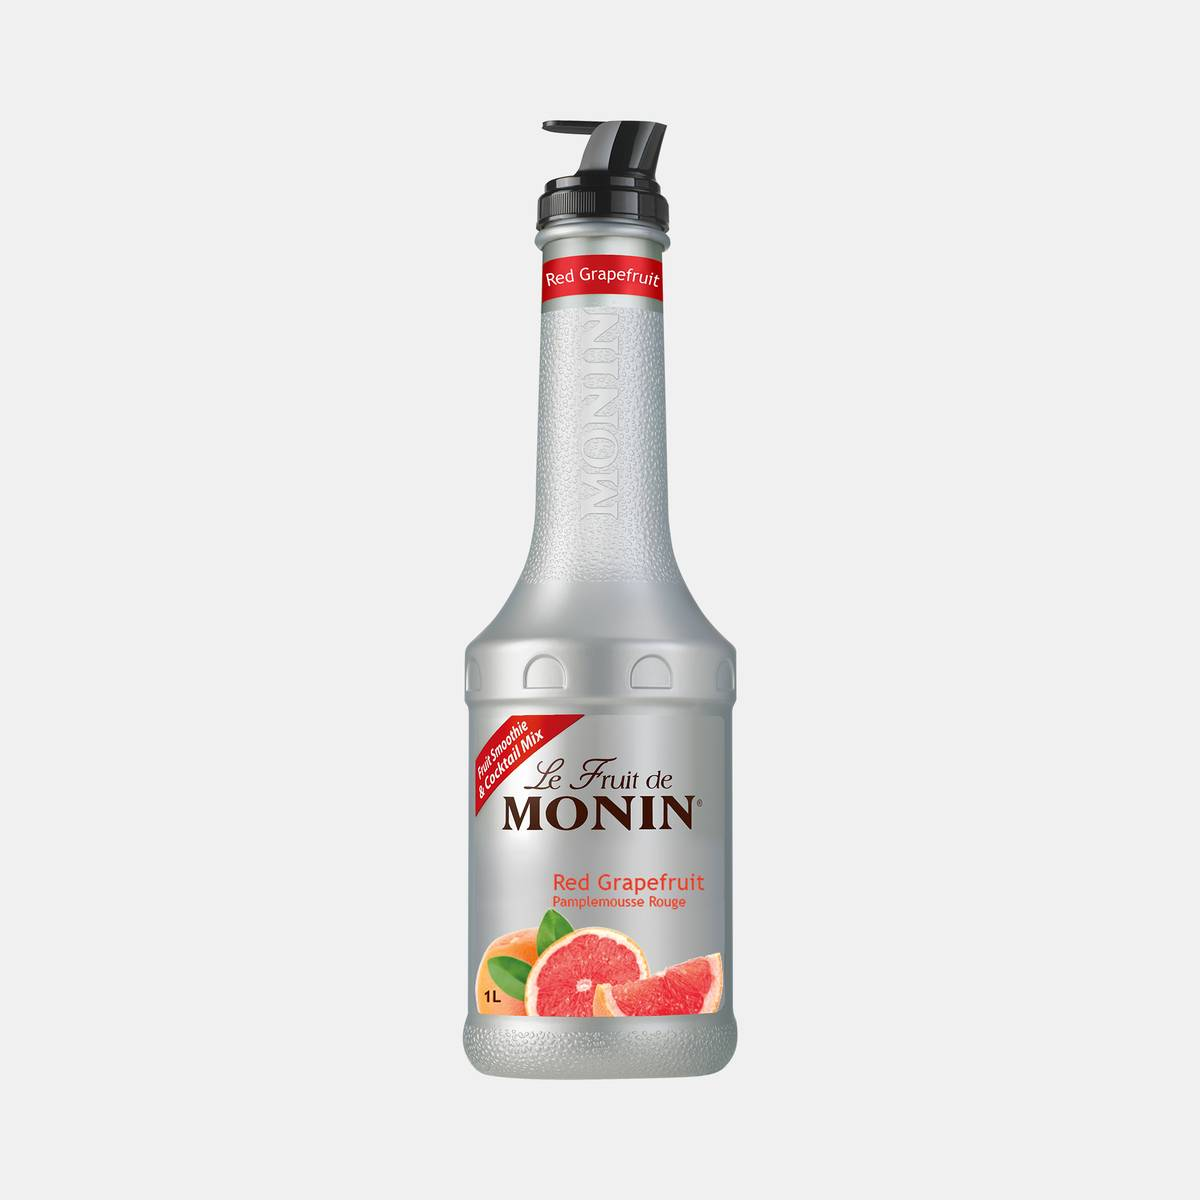 Monin Red Grapefruit Puree Fruit Mix 1 Liter Bottle